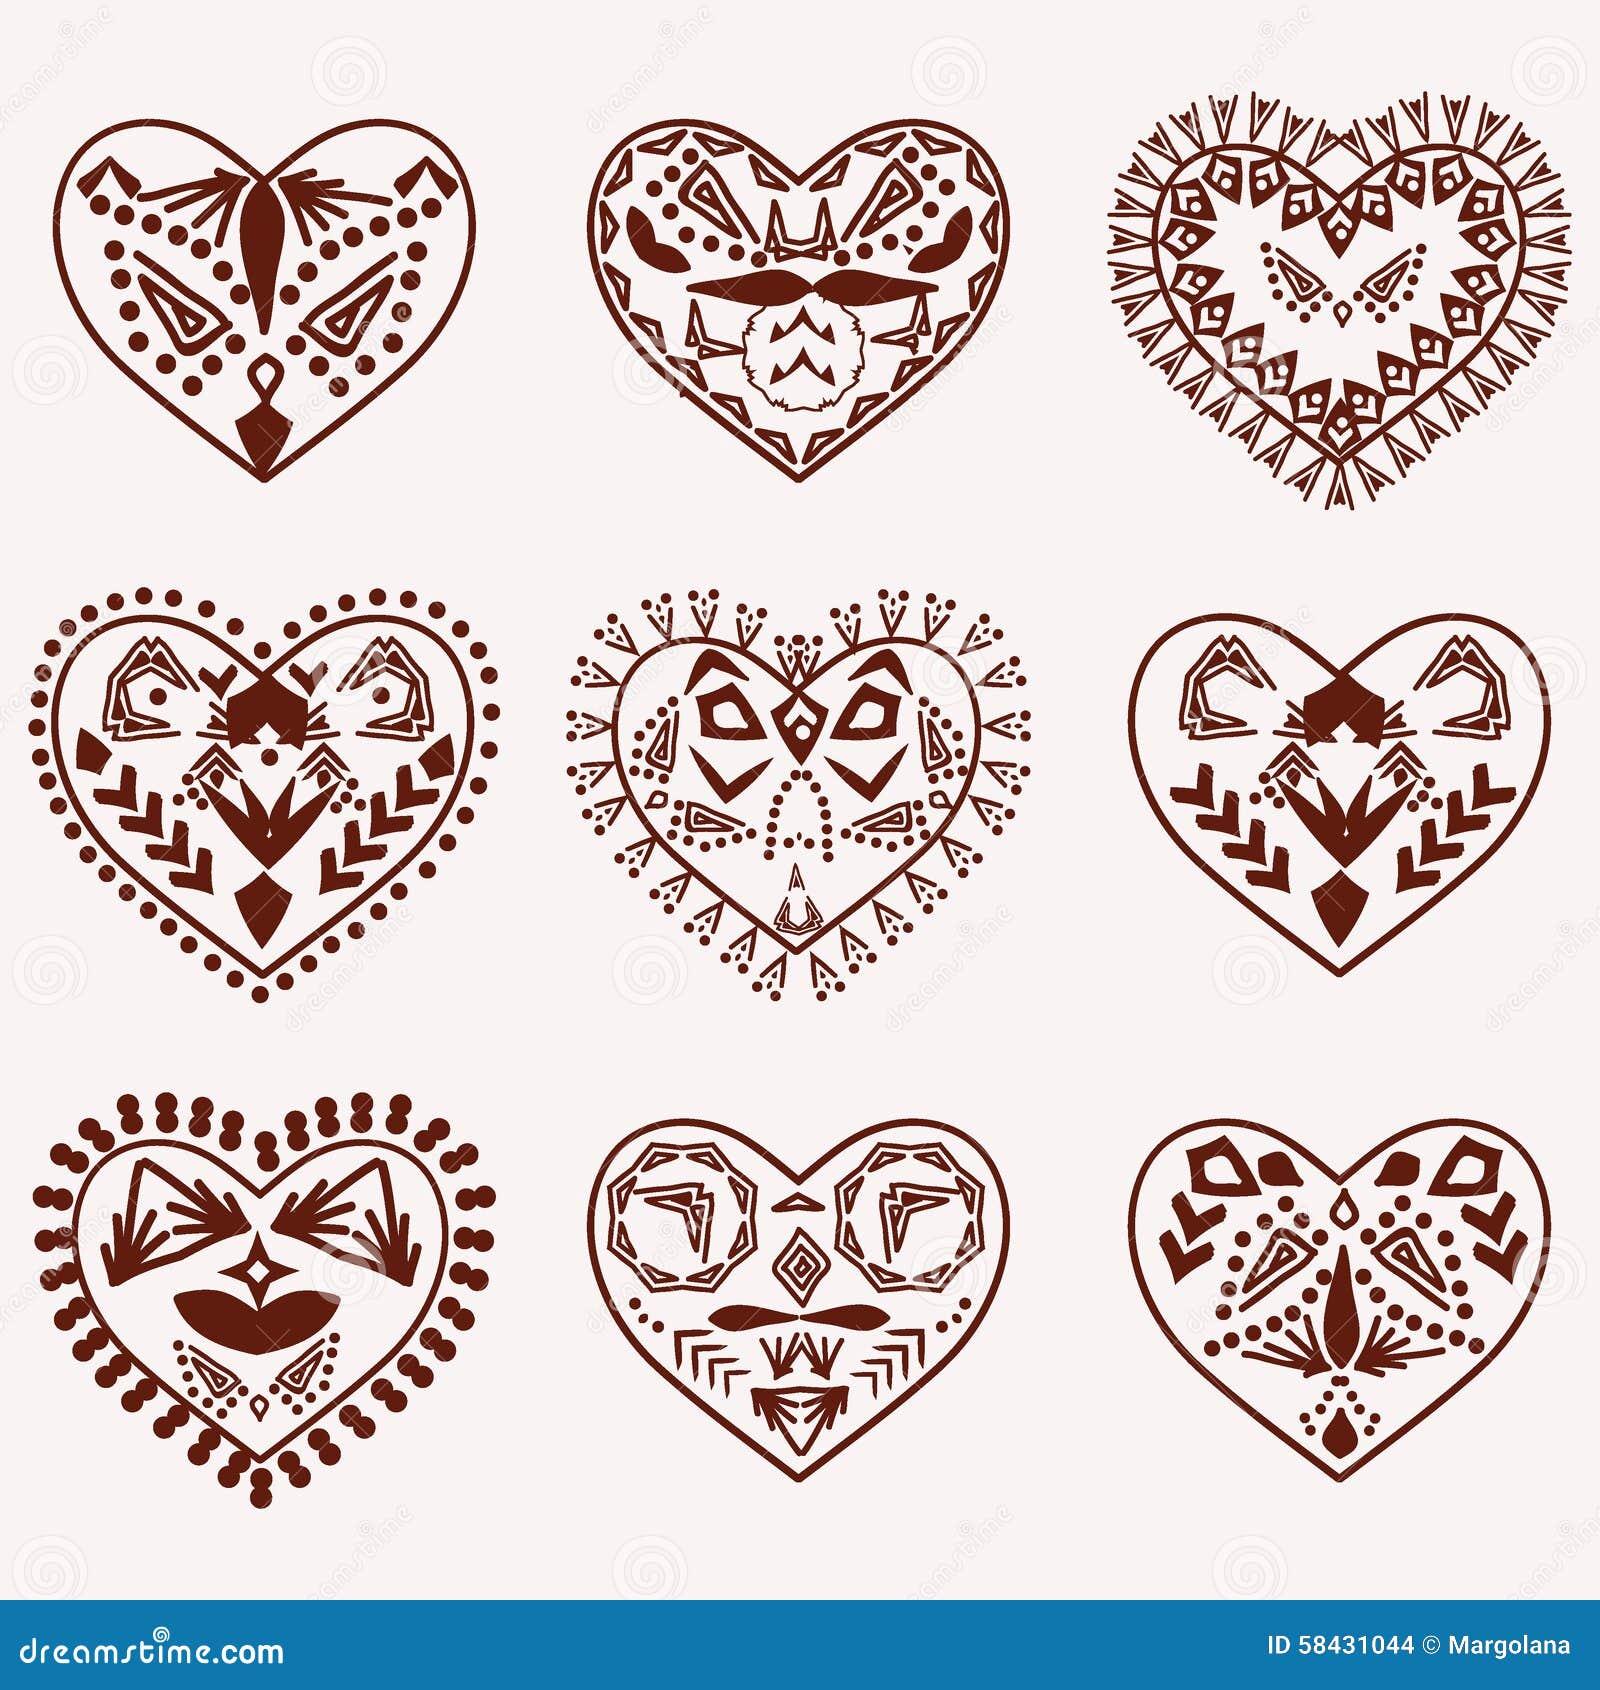 Romantic Hearts Vector Hand Drawn Stock Vector Illustration Of